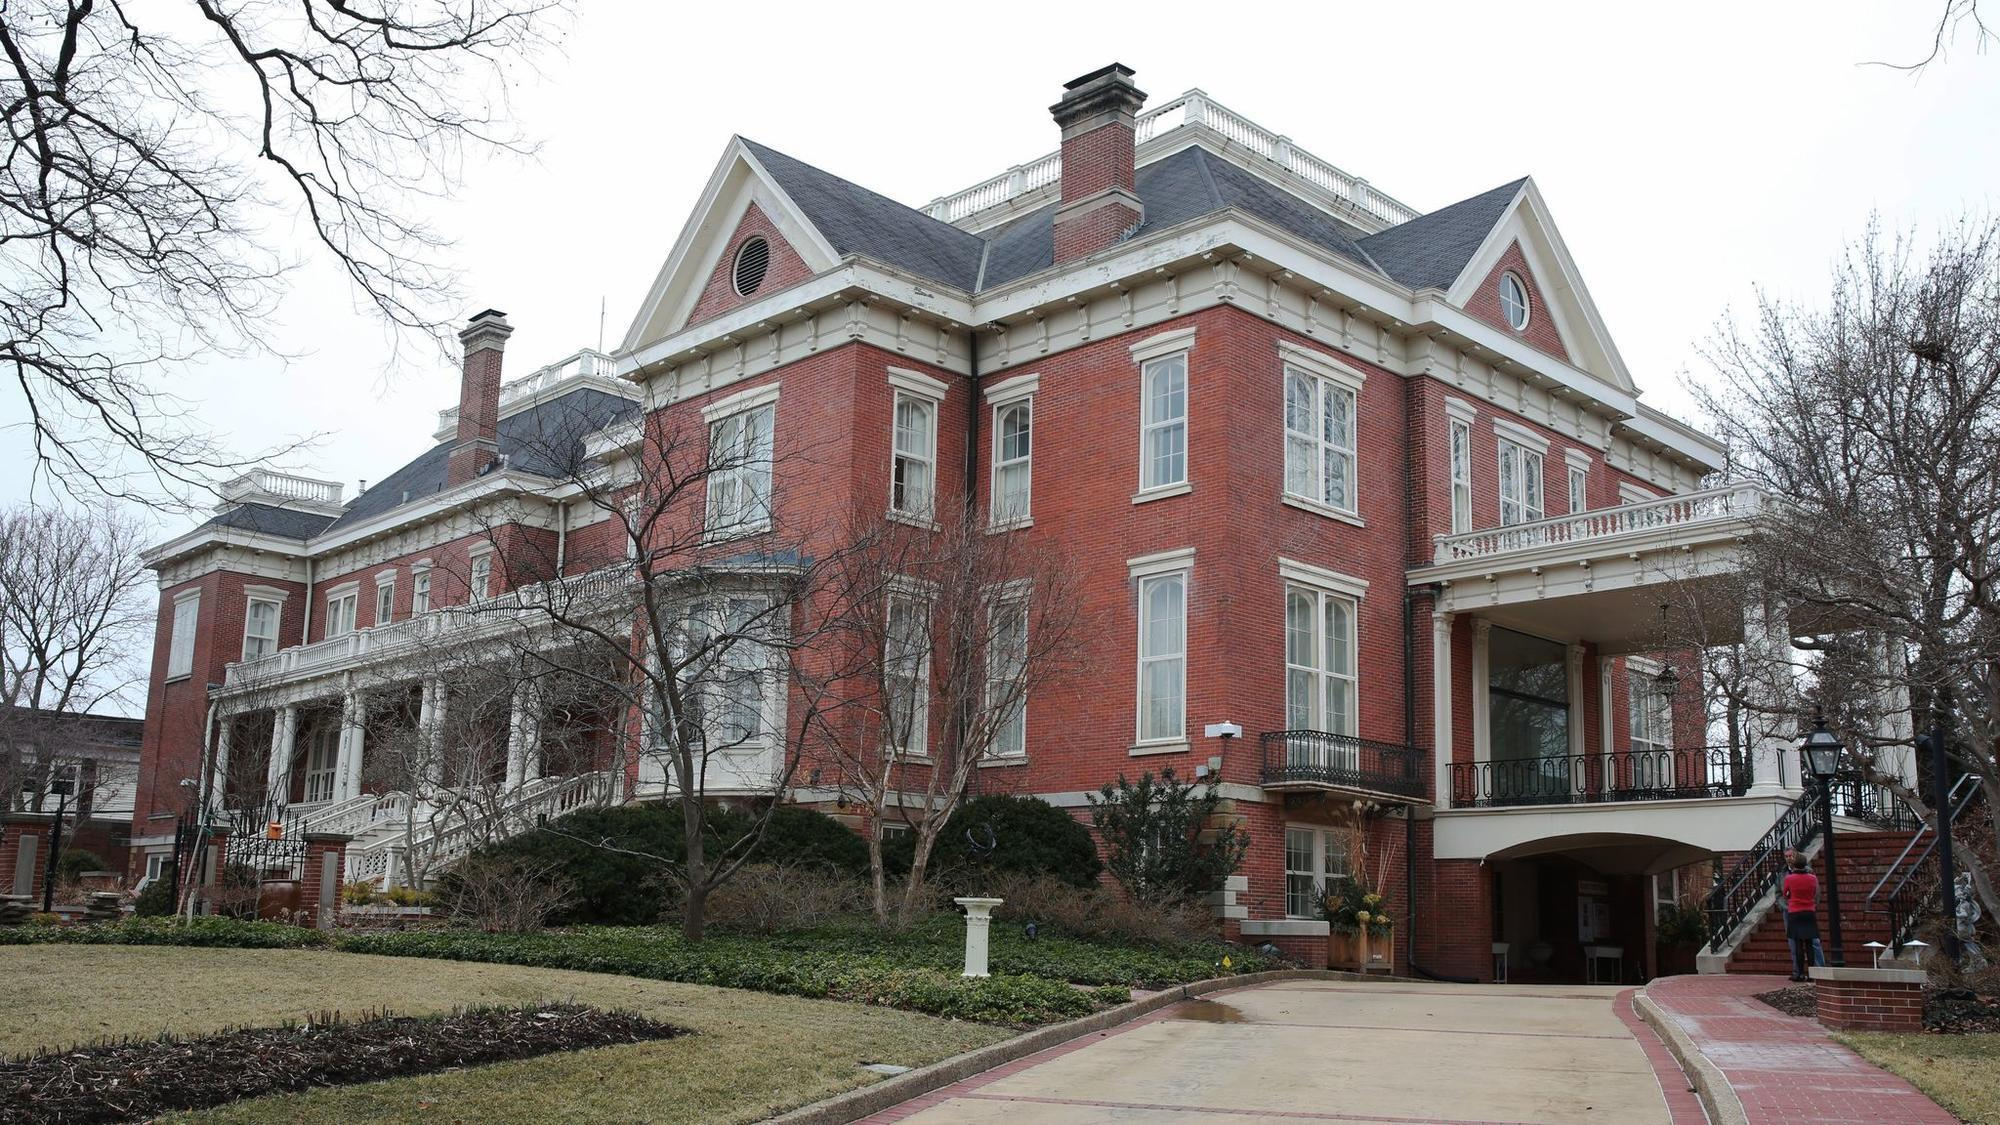 Diana Rauner Calls Governor S Mansion Mess A Metaphor